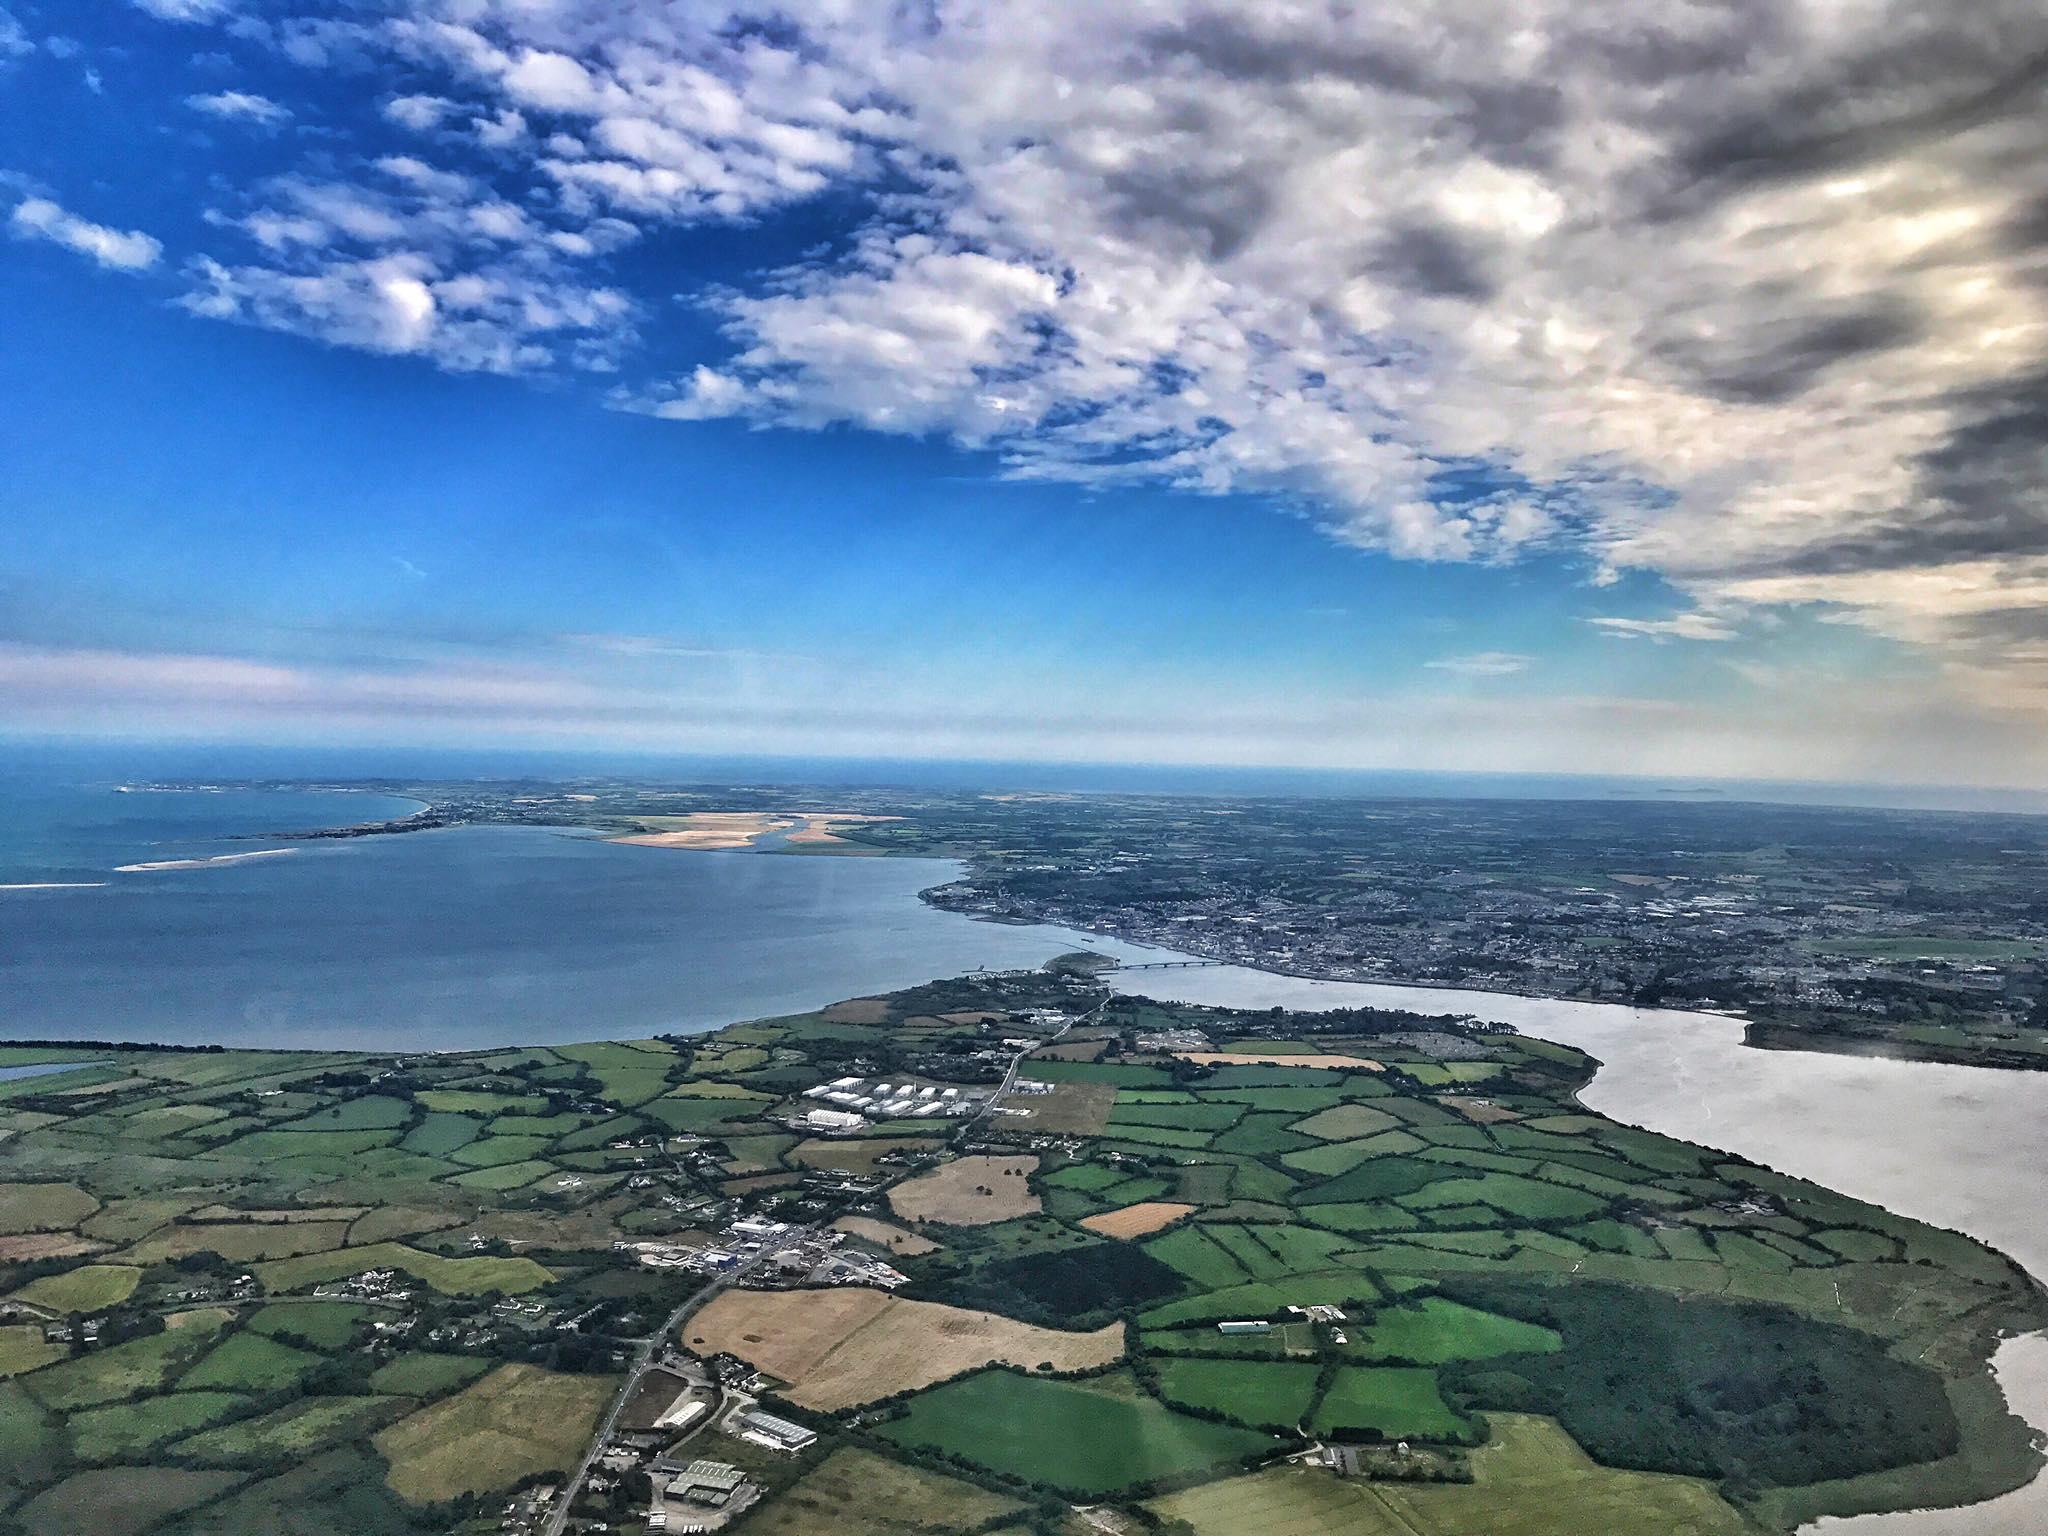 Ireland from the sky